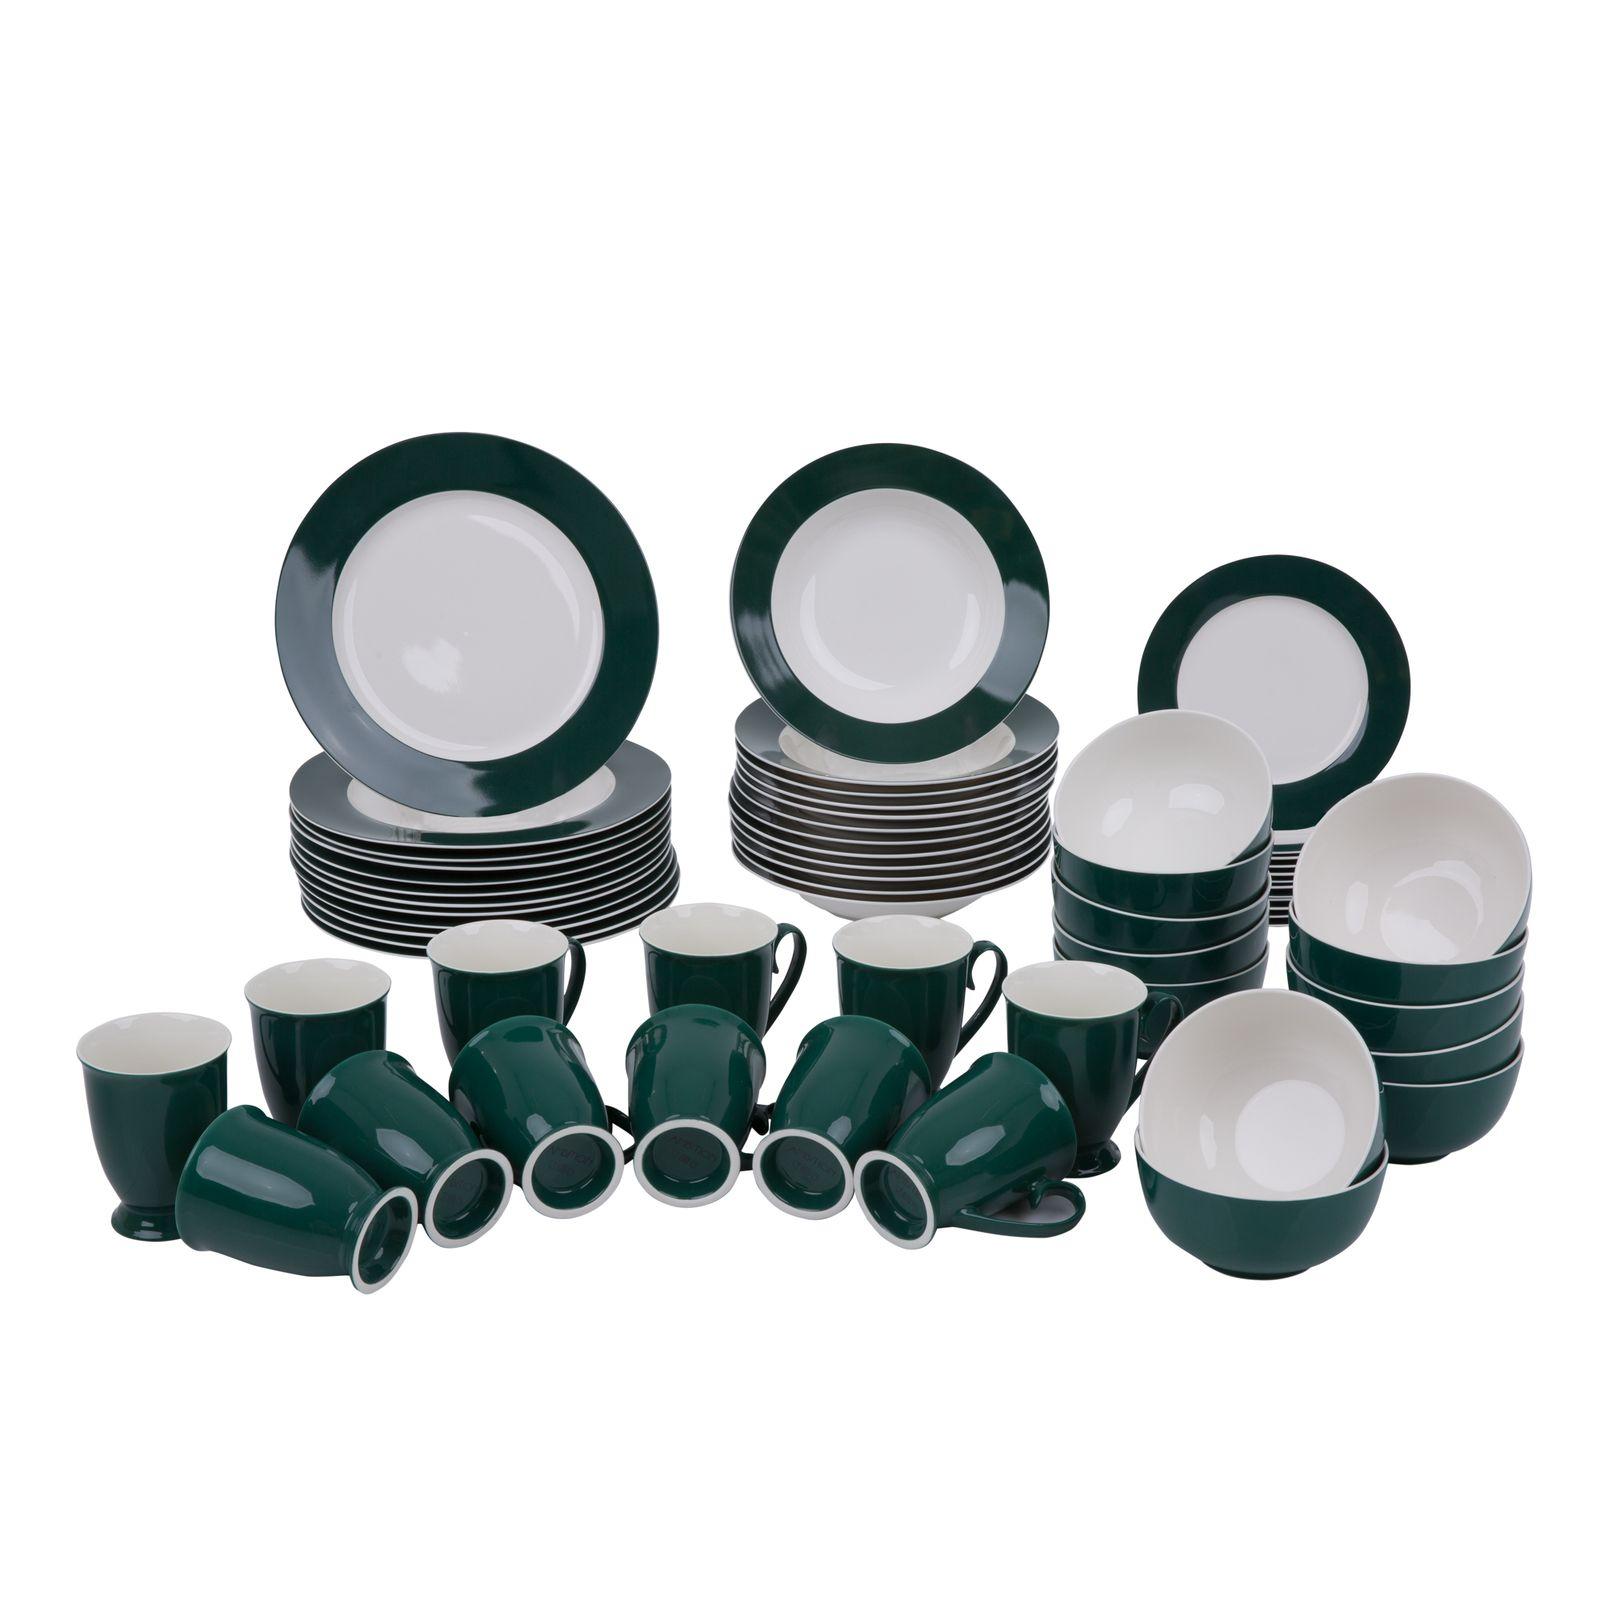 Servizio da tavola Aura Green 60 pezzi AMBITION